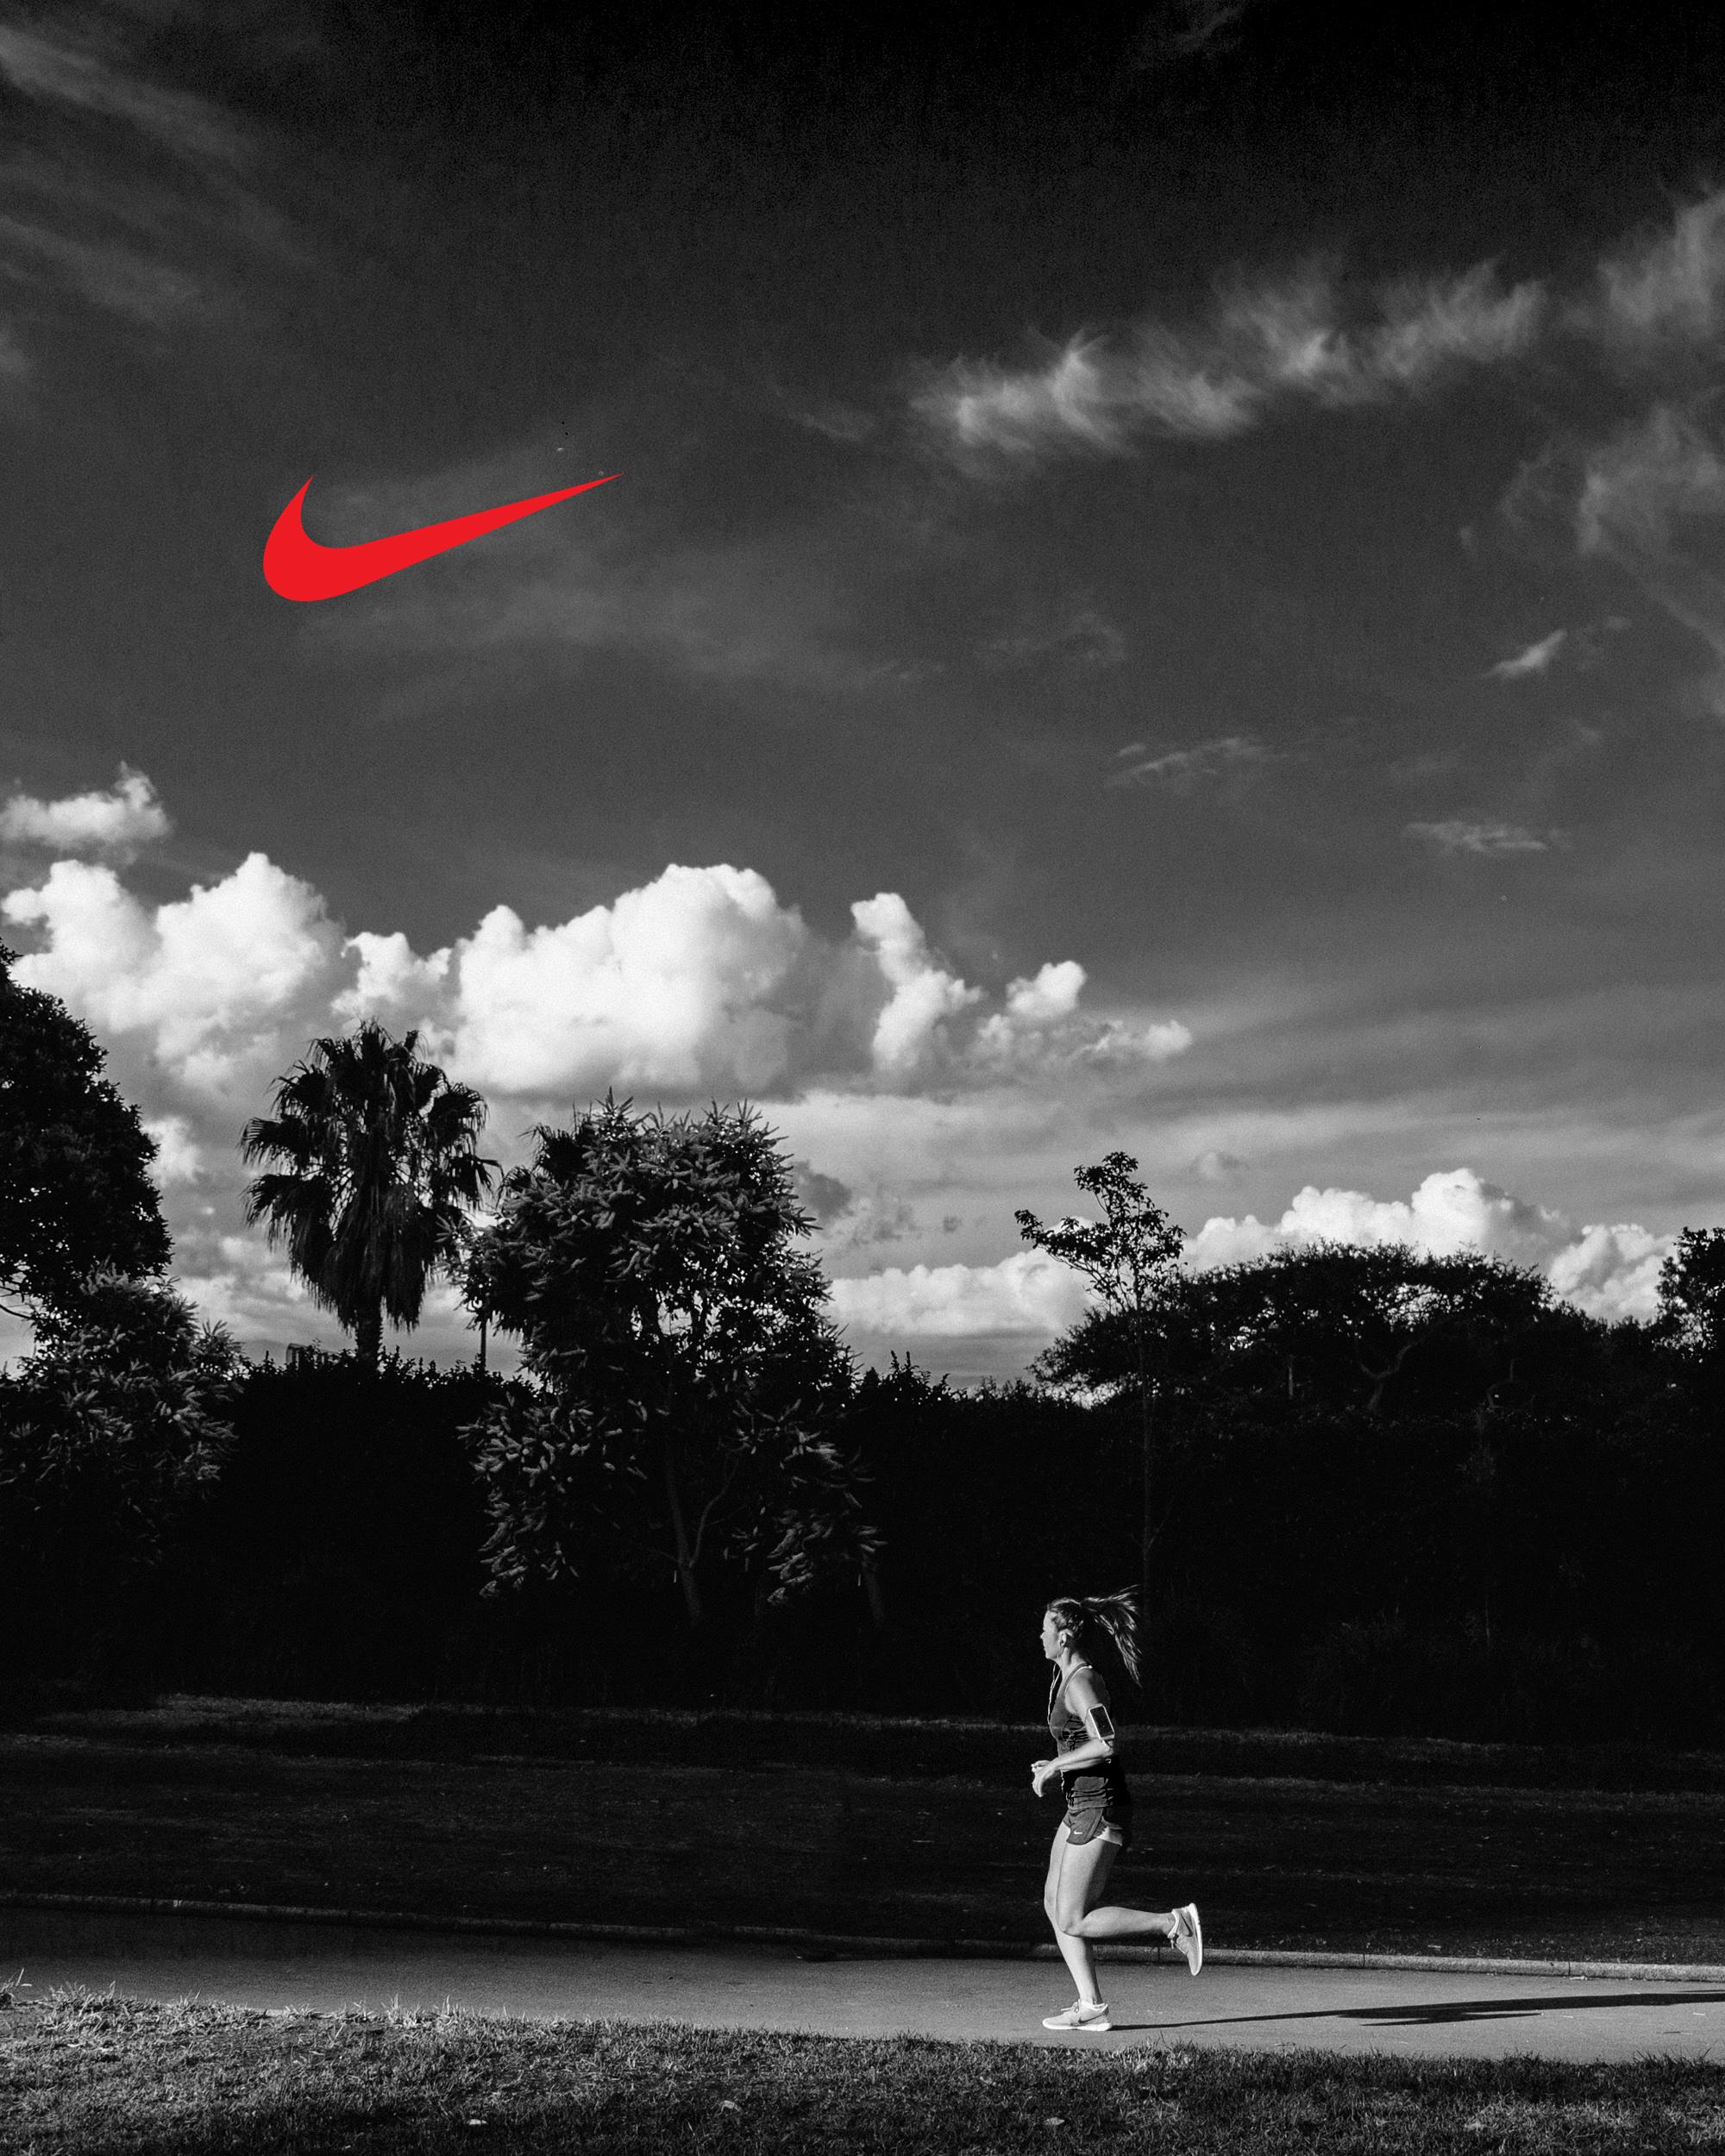 160131_Nike-Running_0737-1.jpg